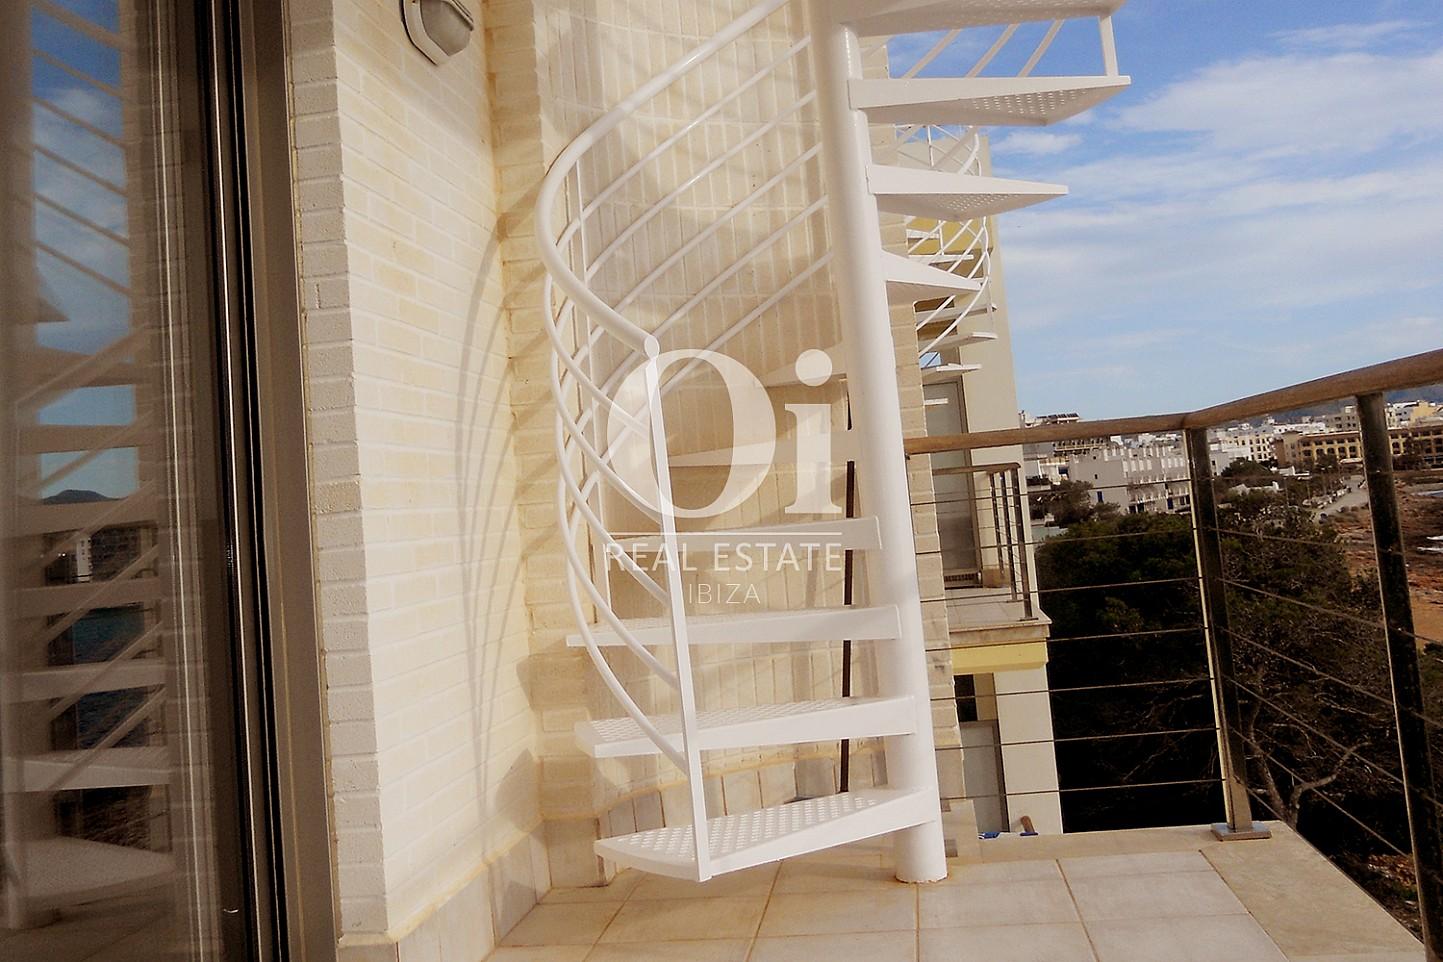 Escalera de piso en venta en Cala Gració, zona de Sant Antoni, Ibiza